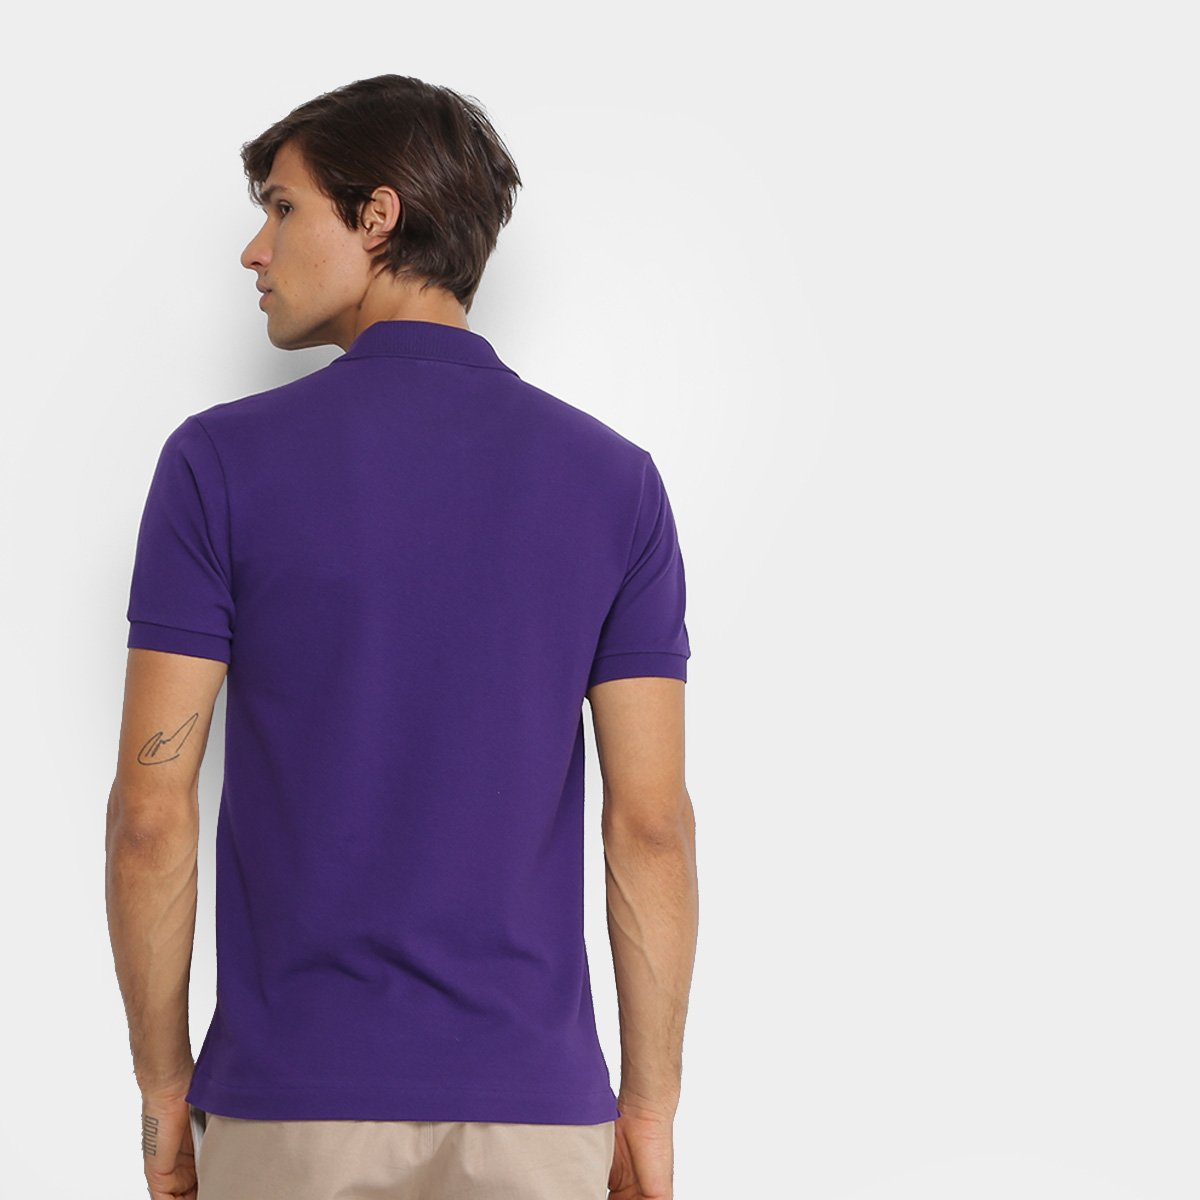 Camisa Polo Lacoste Piquet Original Masculina  d3888dbe28ce2